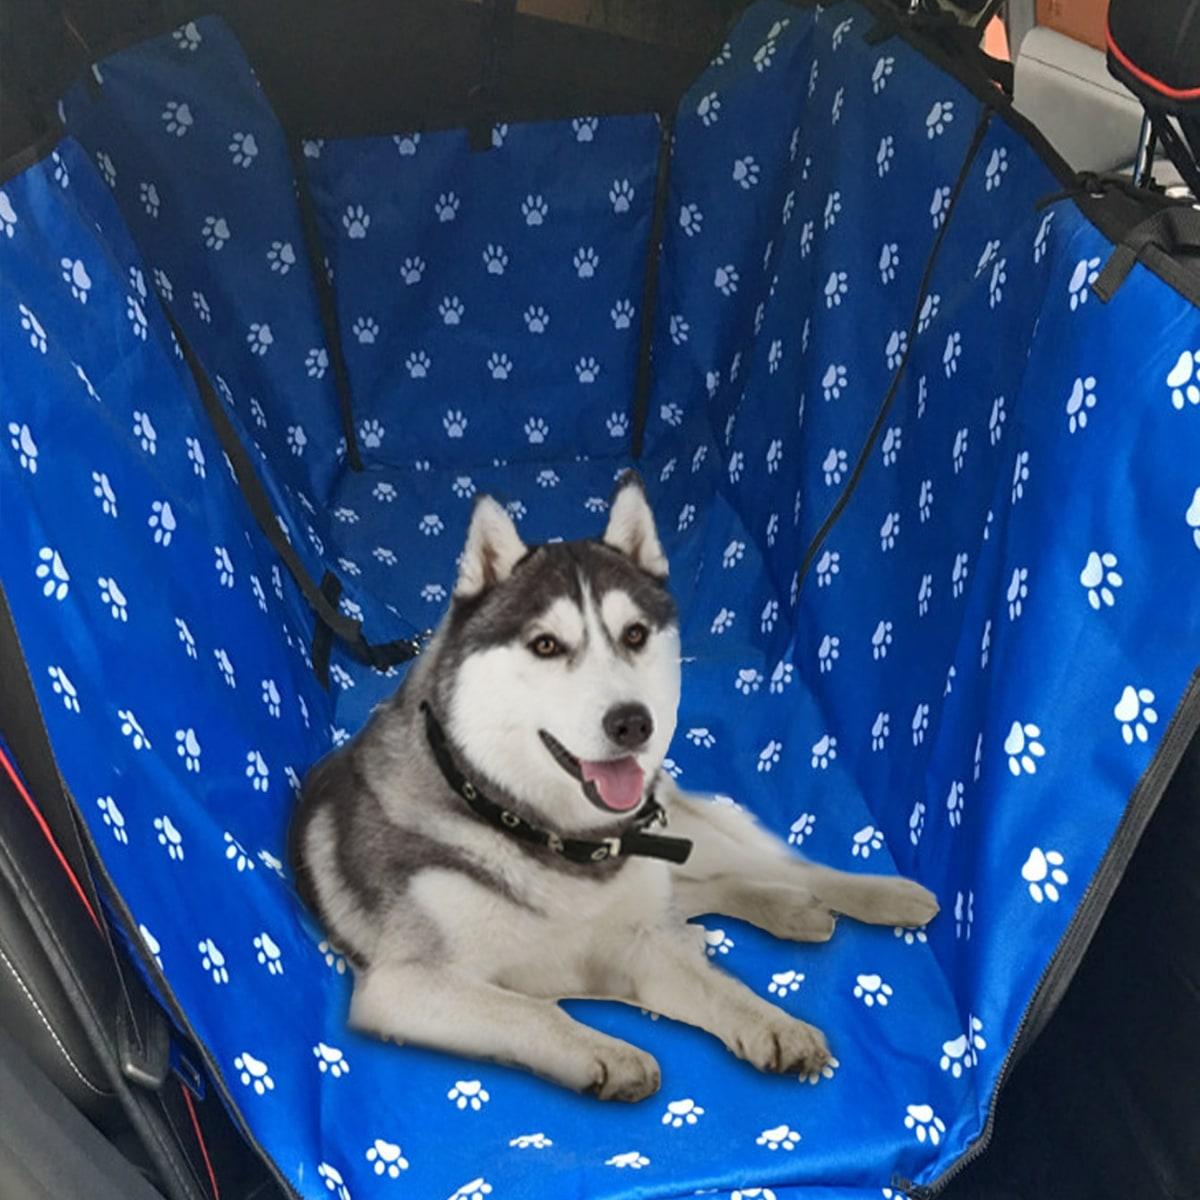 1 Stück Hunde wasserbeständiger Hängematten Autositzbezug